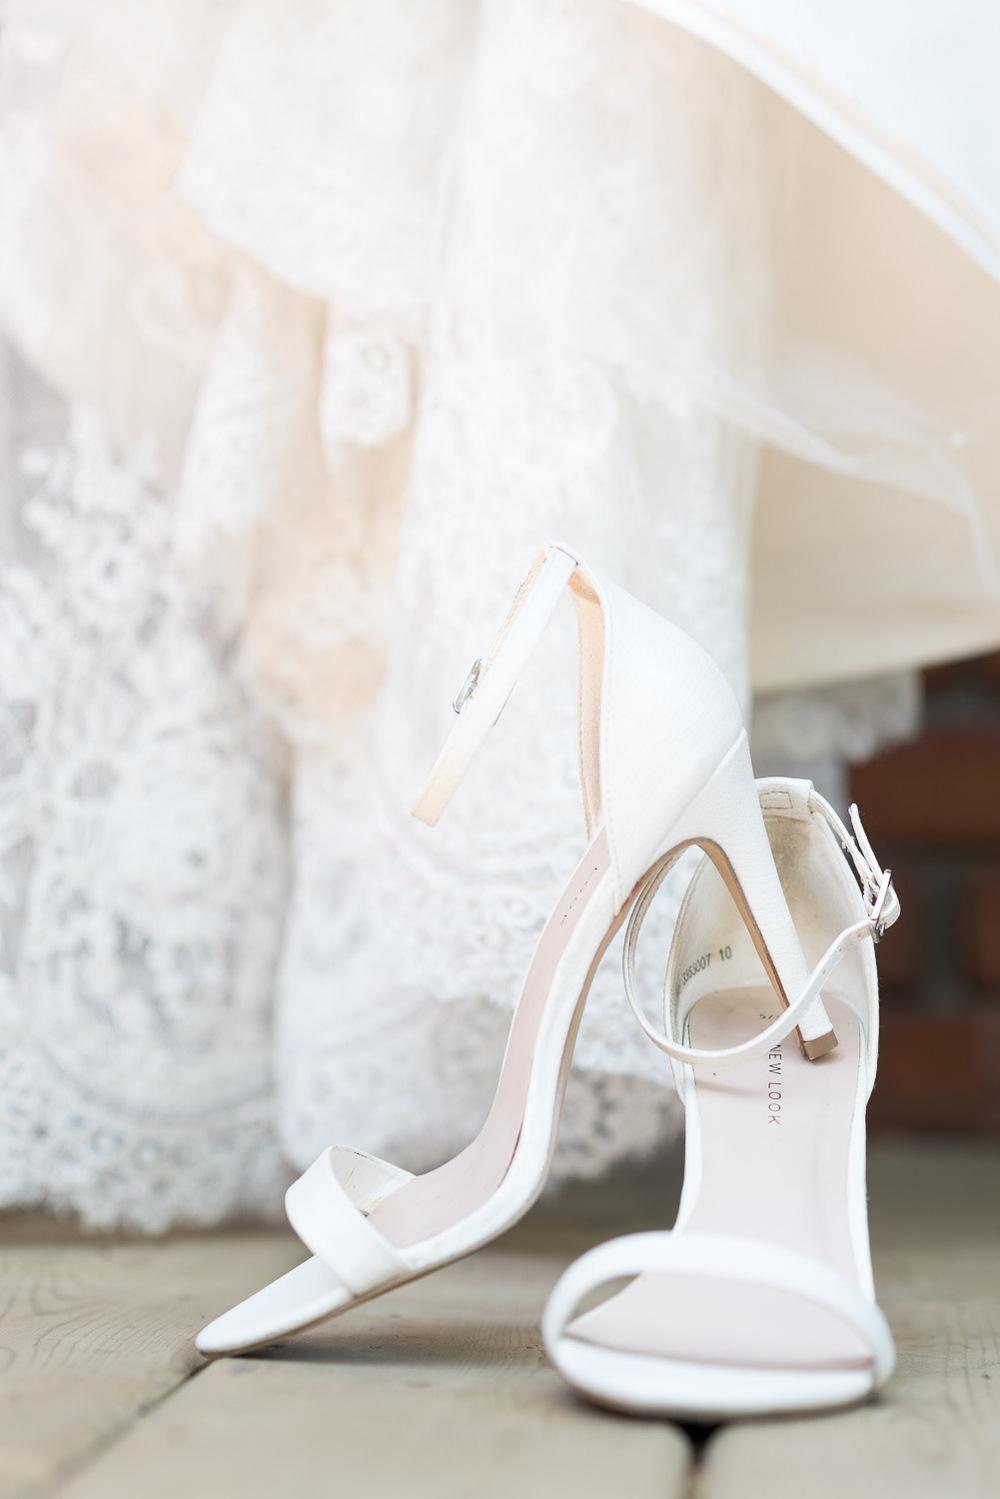 S&M_TORONTO_WEDDING_PHOTOGRAPHY_003.jpg